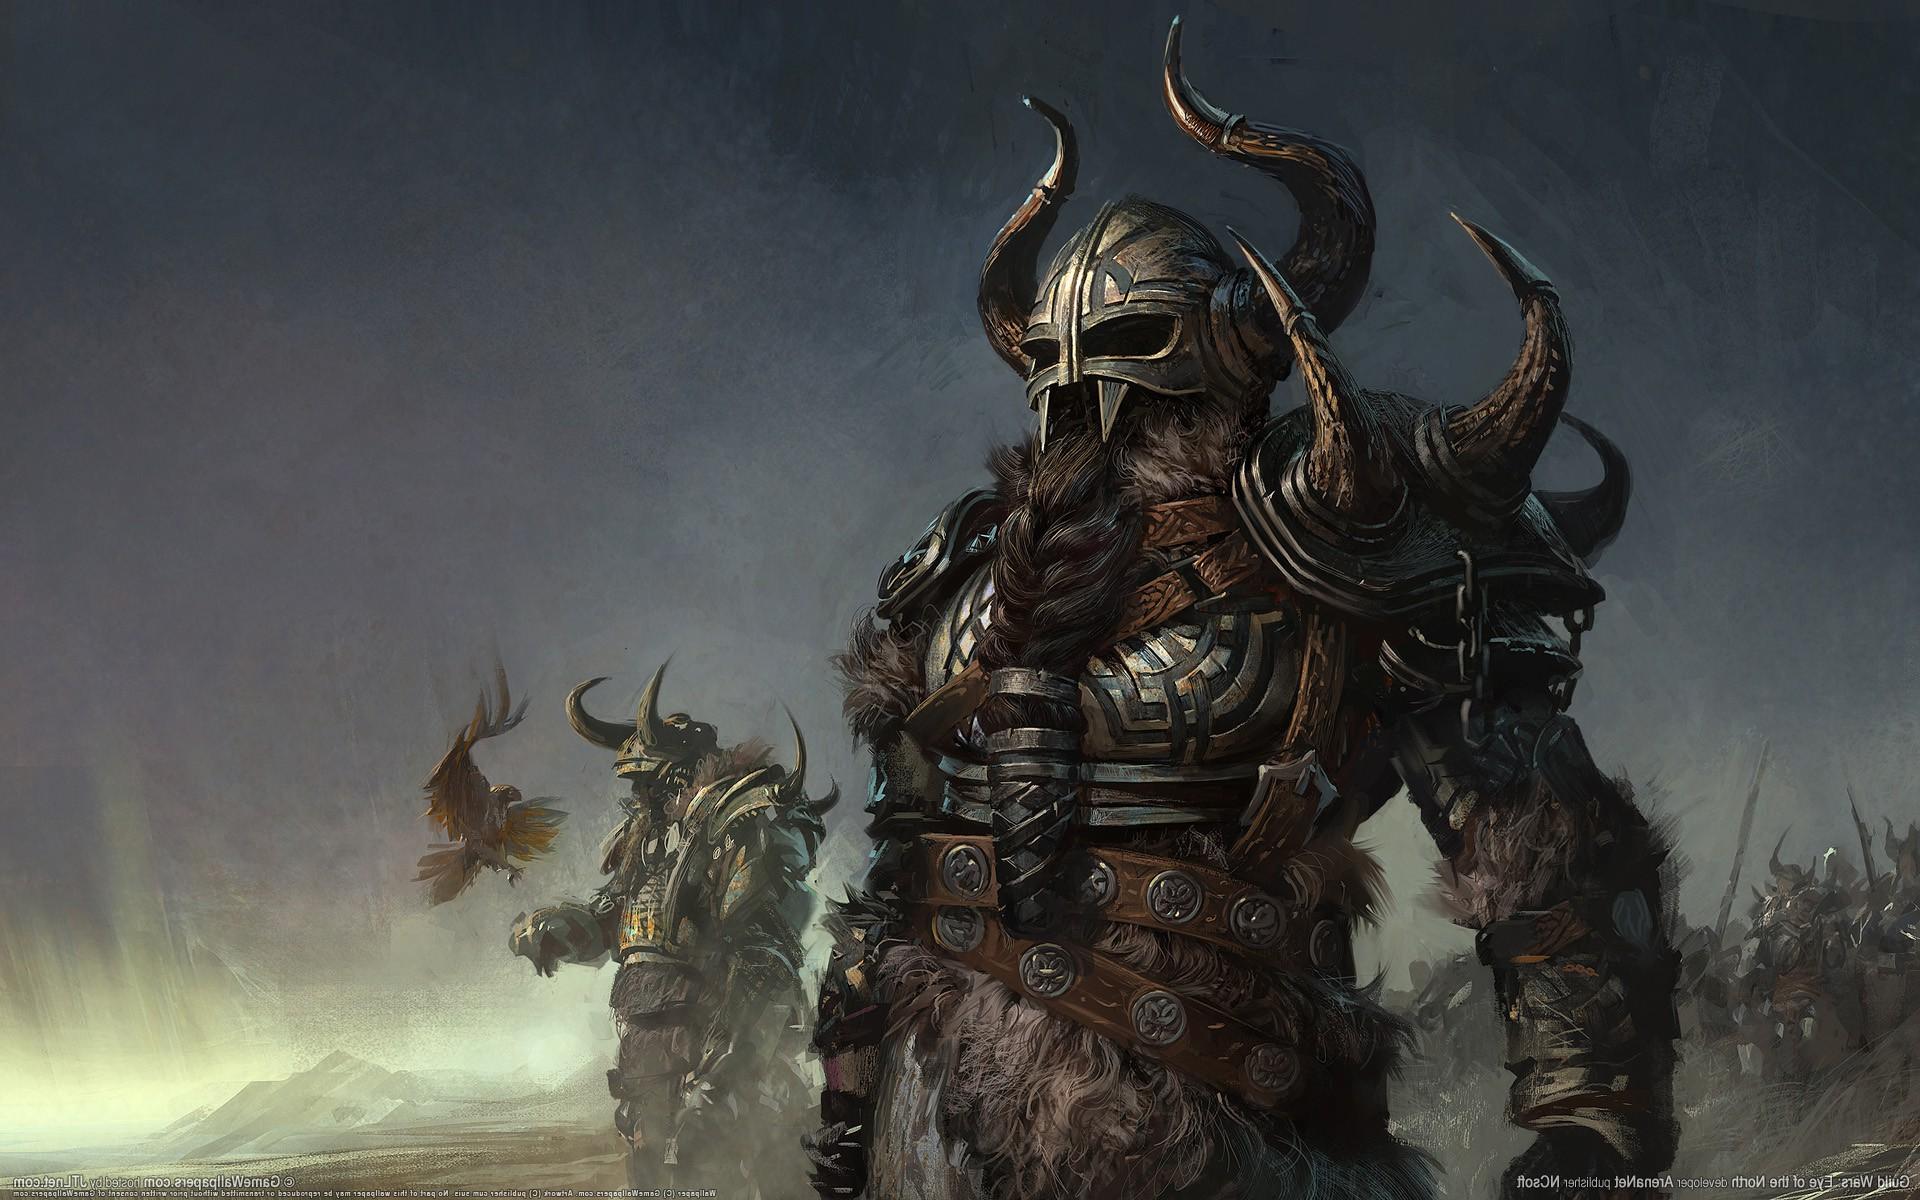 Wallpaper : video games, Guild Wars 2, mythology, screenshot